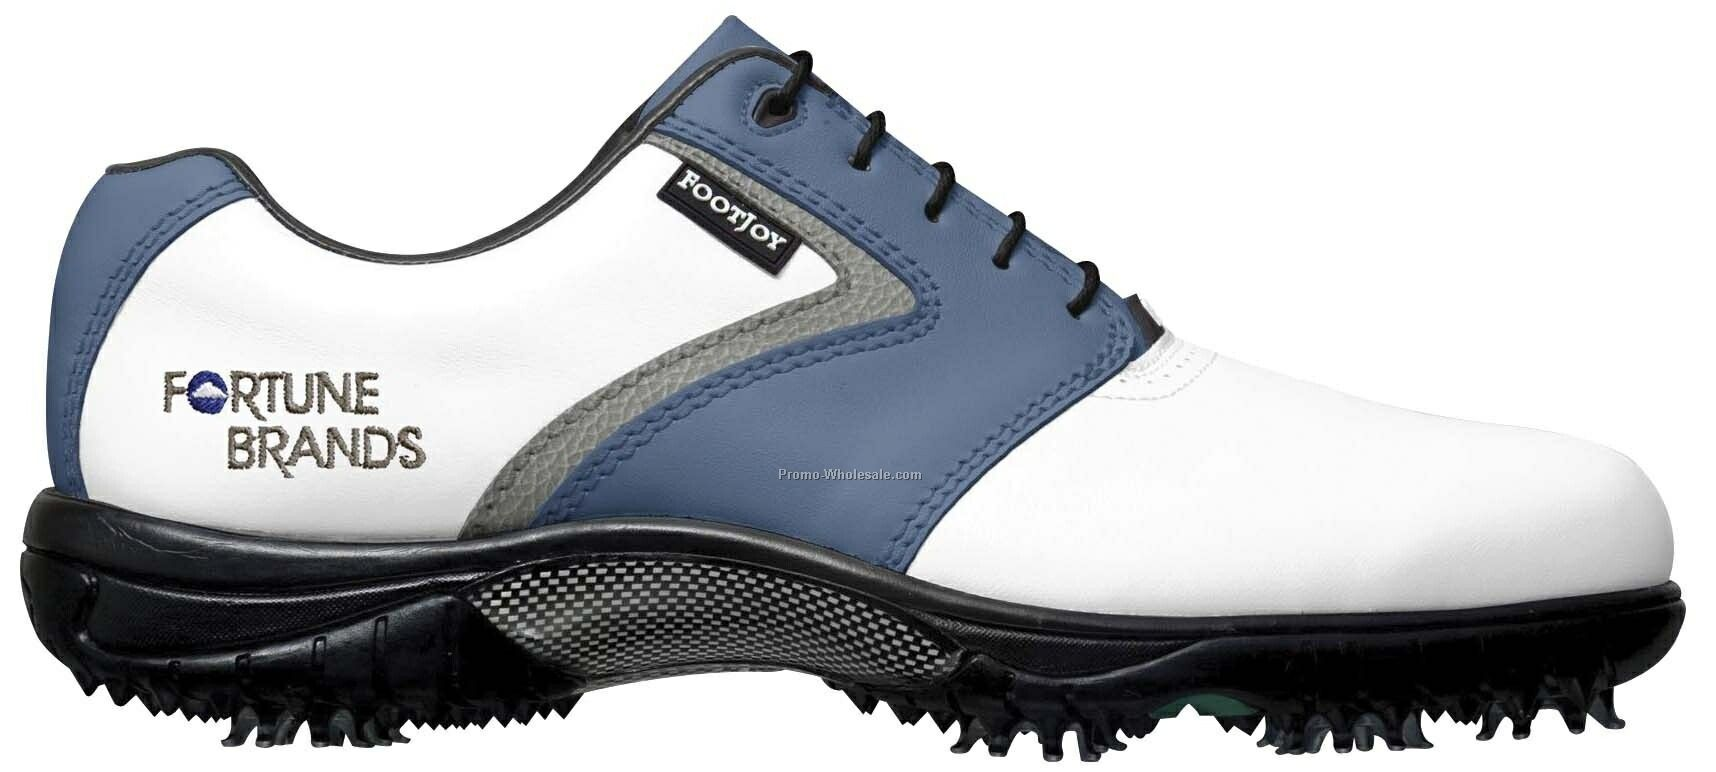 Footjoy Myjoys Contour Golf Shoe